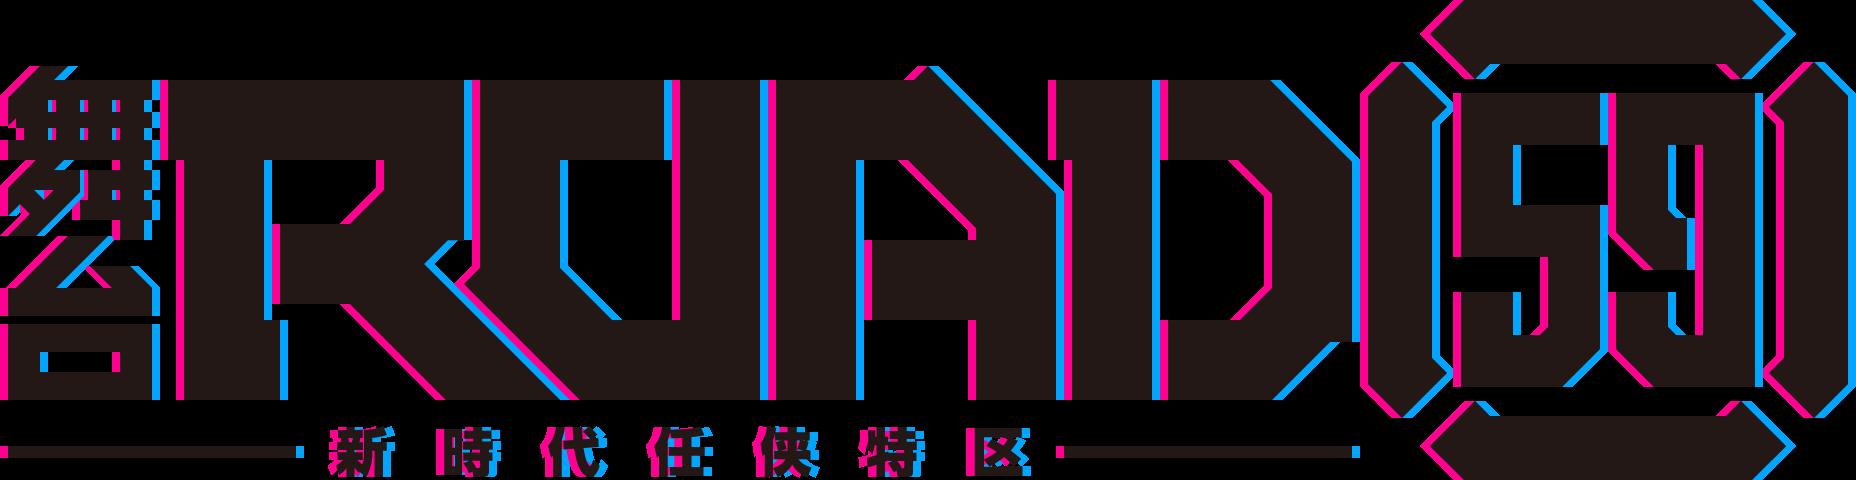 「ROAD59 -新時代任侠特区-」初のキャスト登壇スペシャルイベントが 2021年9月25日(土)開催決定!